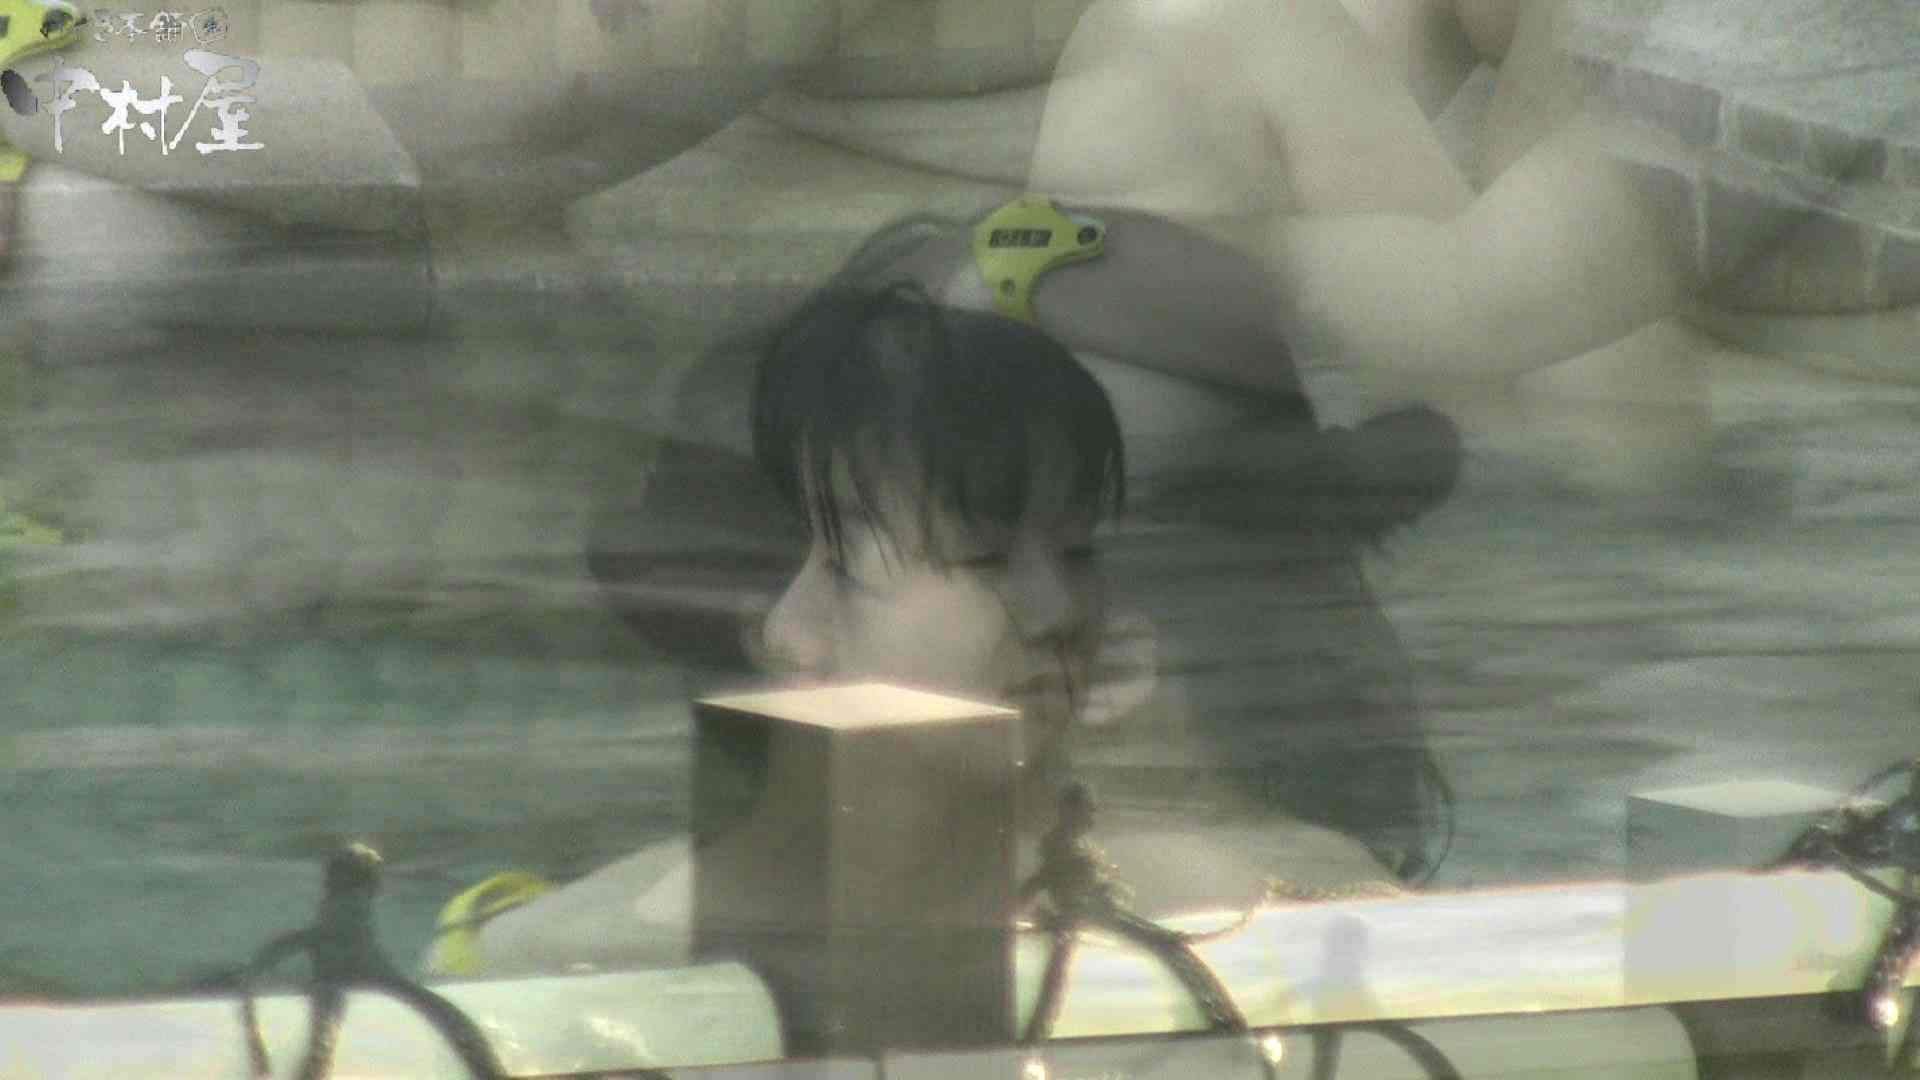 Aquaな露天風呂Vol.904 OL  60連発 27